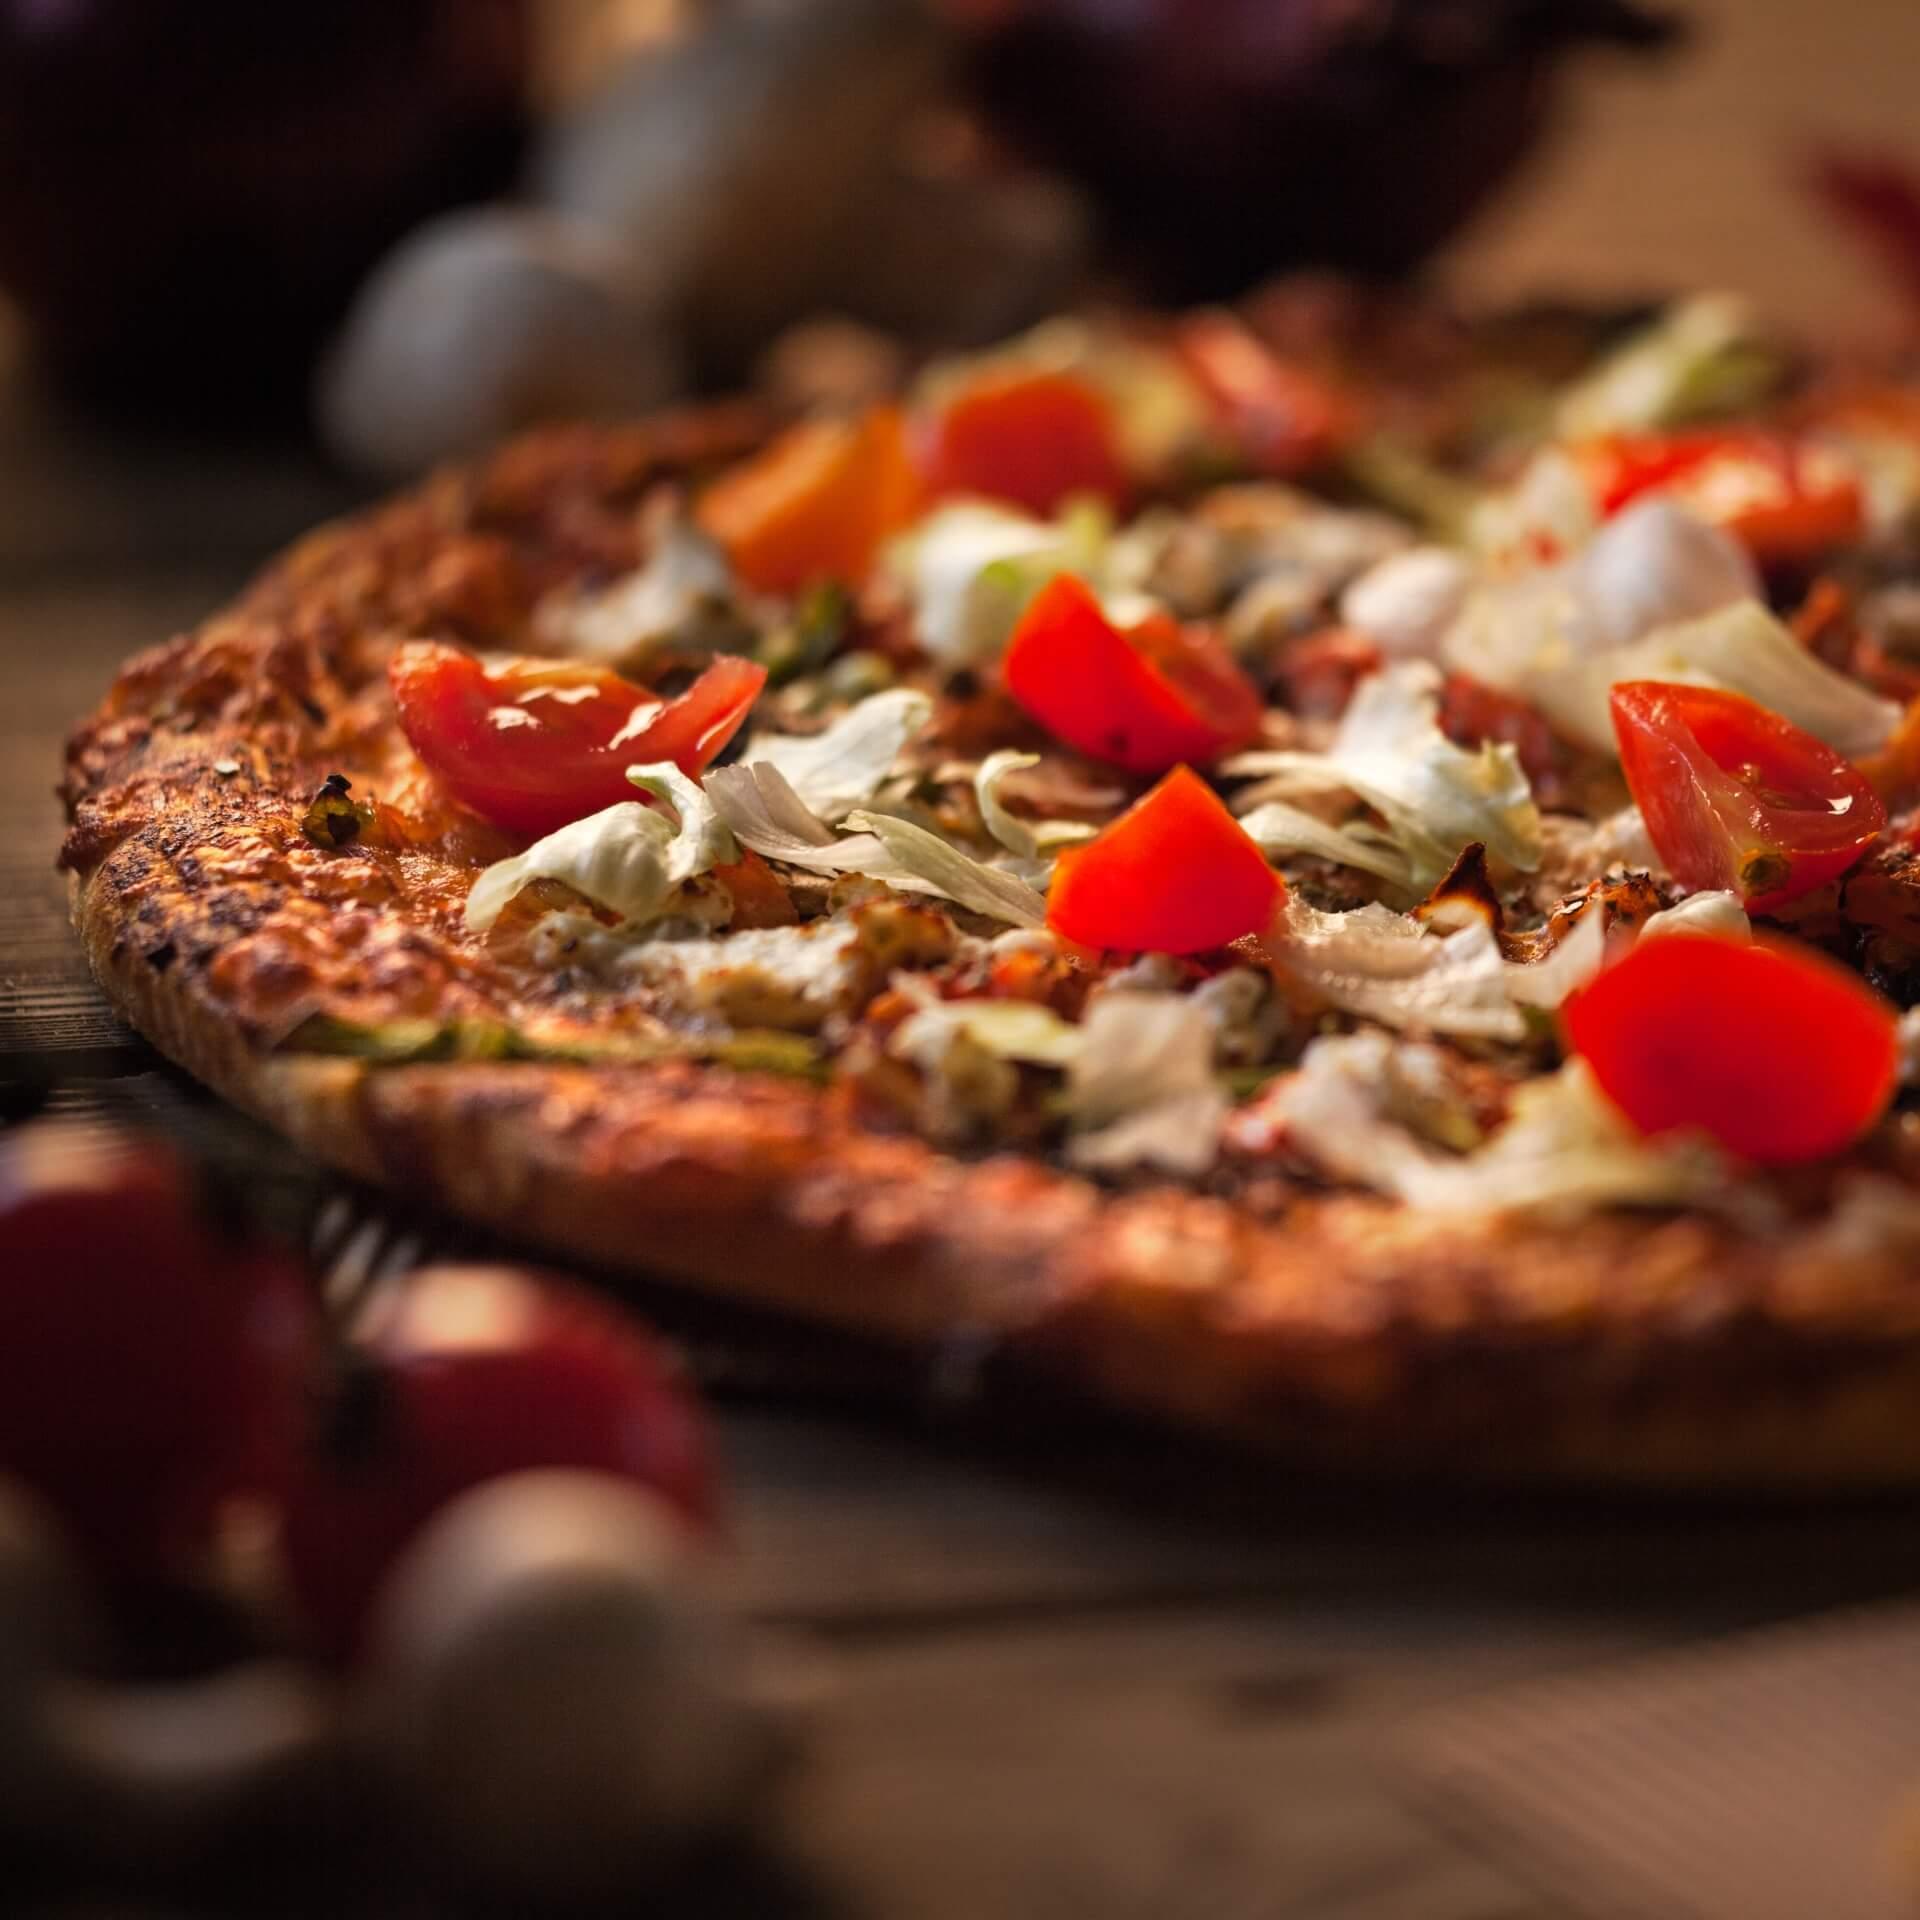 Pizzeria Longueuil menu - Pizzeria menu Longueuil